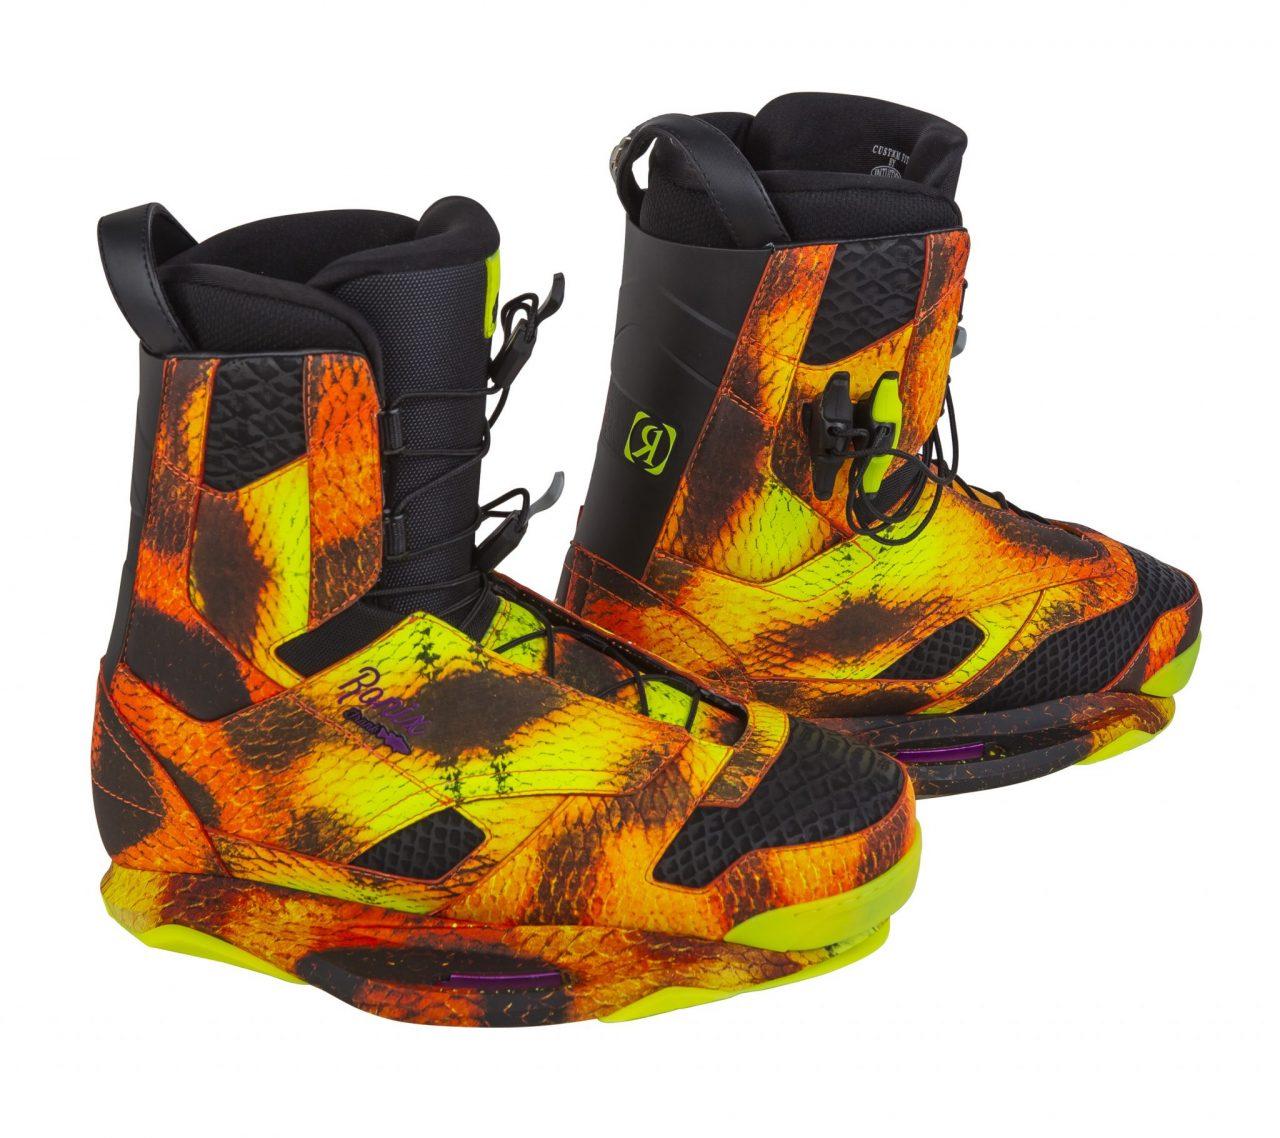 2015 Ronix Frank Boots